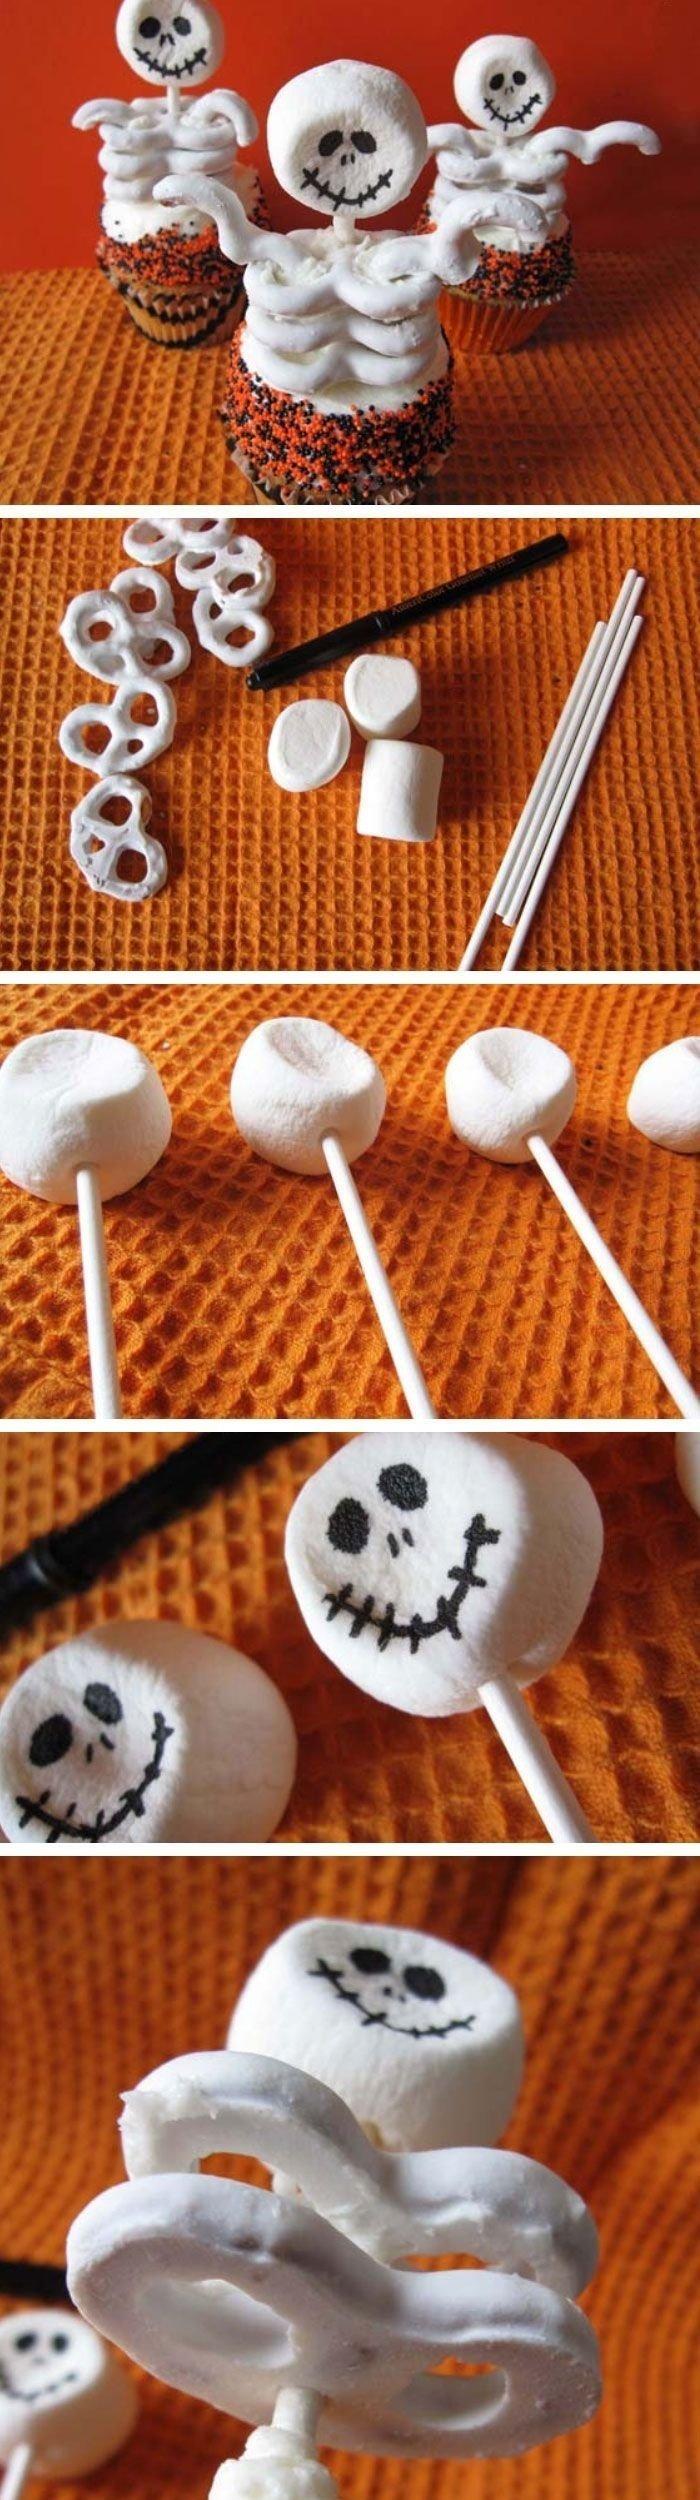 10 Great Kids Halloween Party Food Ideas 28 diy halloween party ideas for kids halloween repas halloween 2020